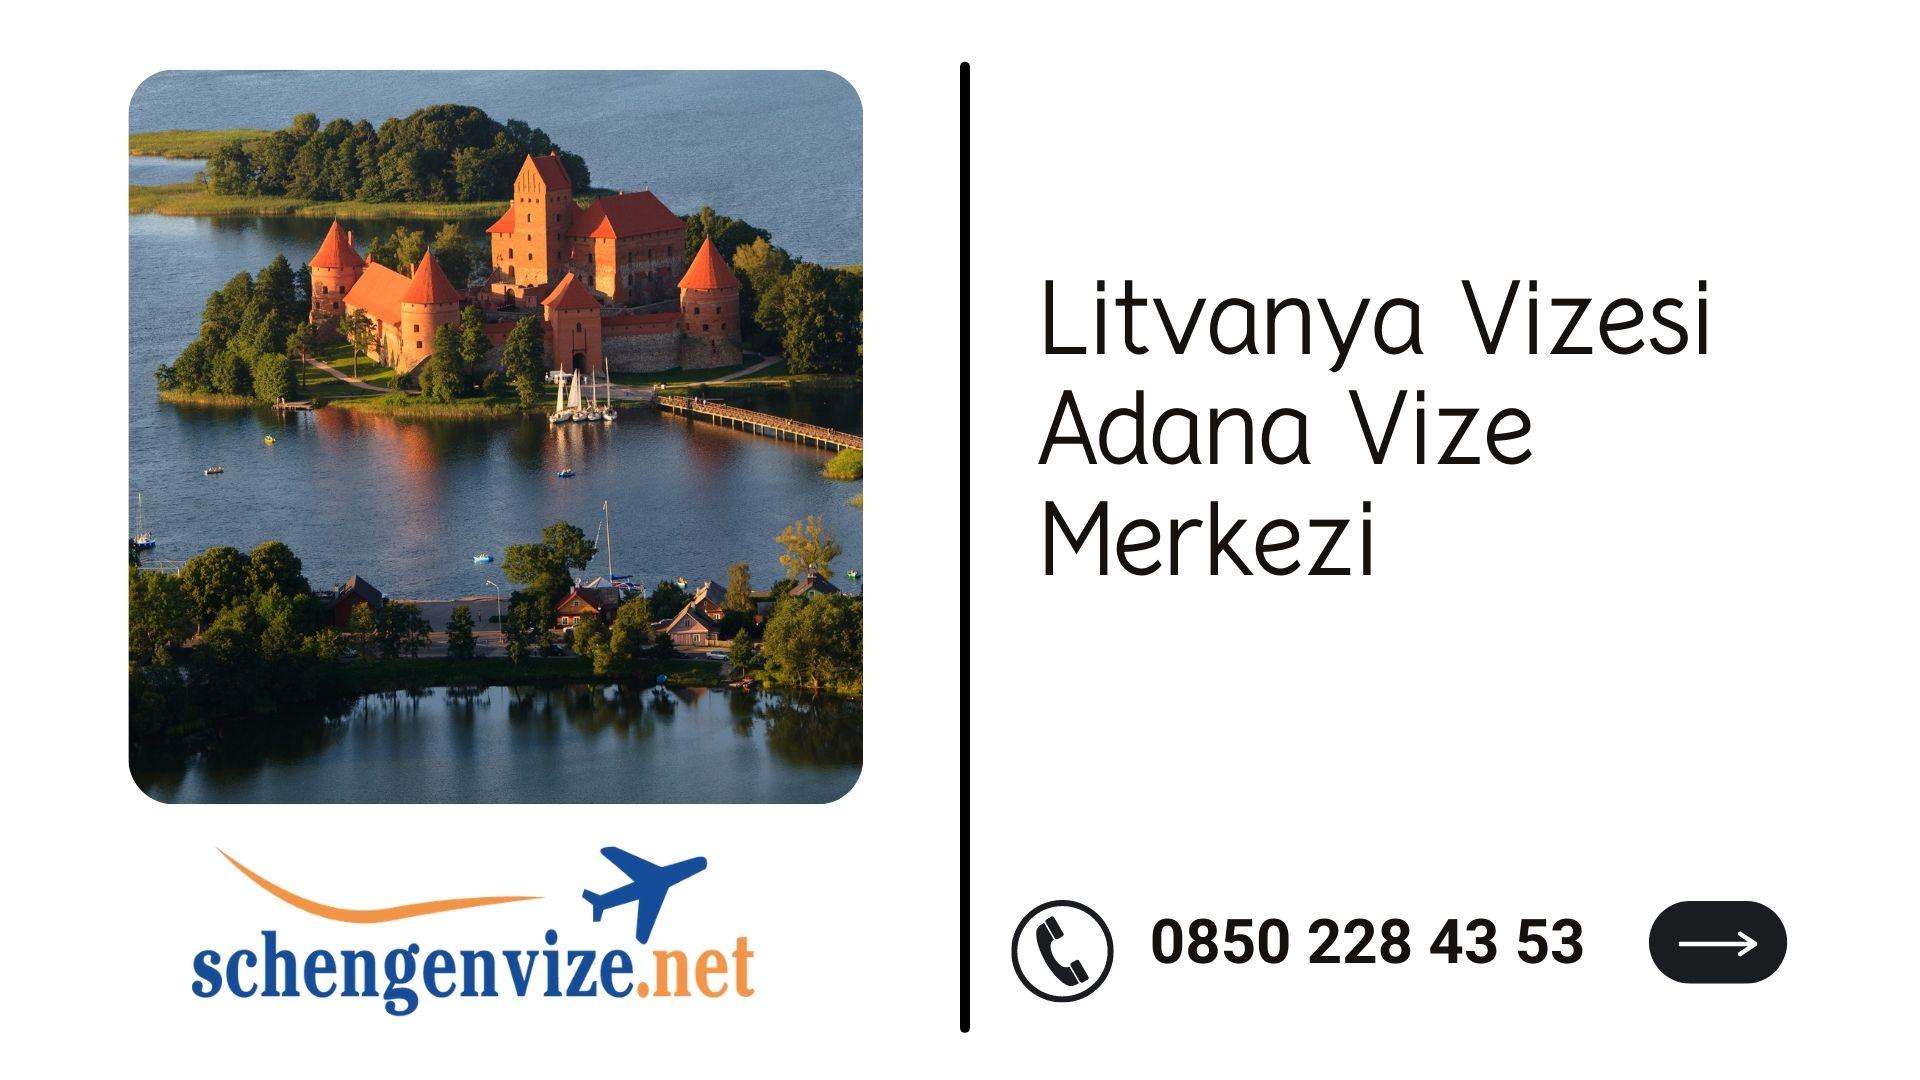 Litvanya Vizesi Adana Vize Merkezi